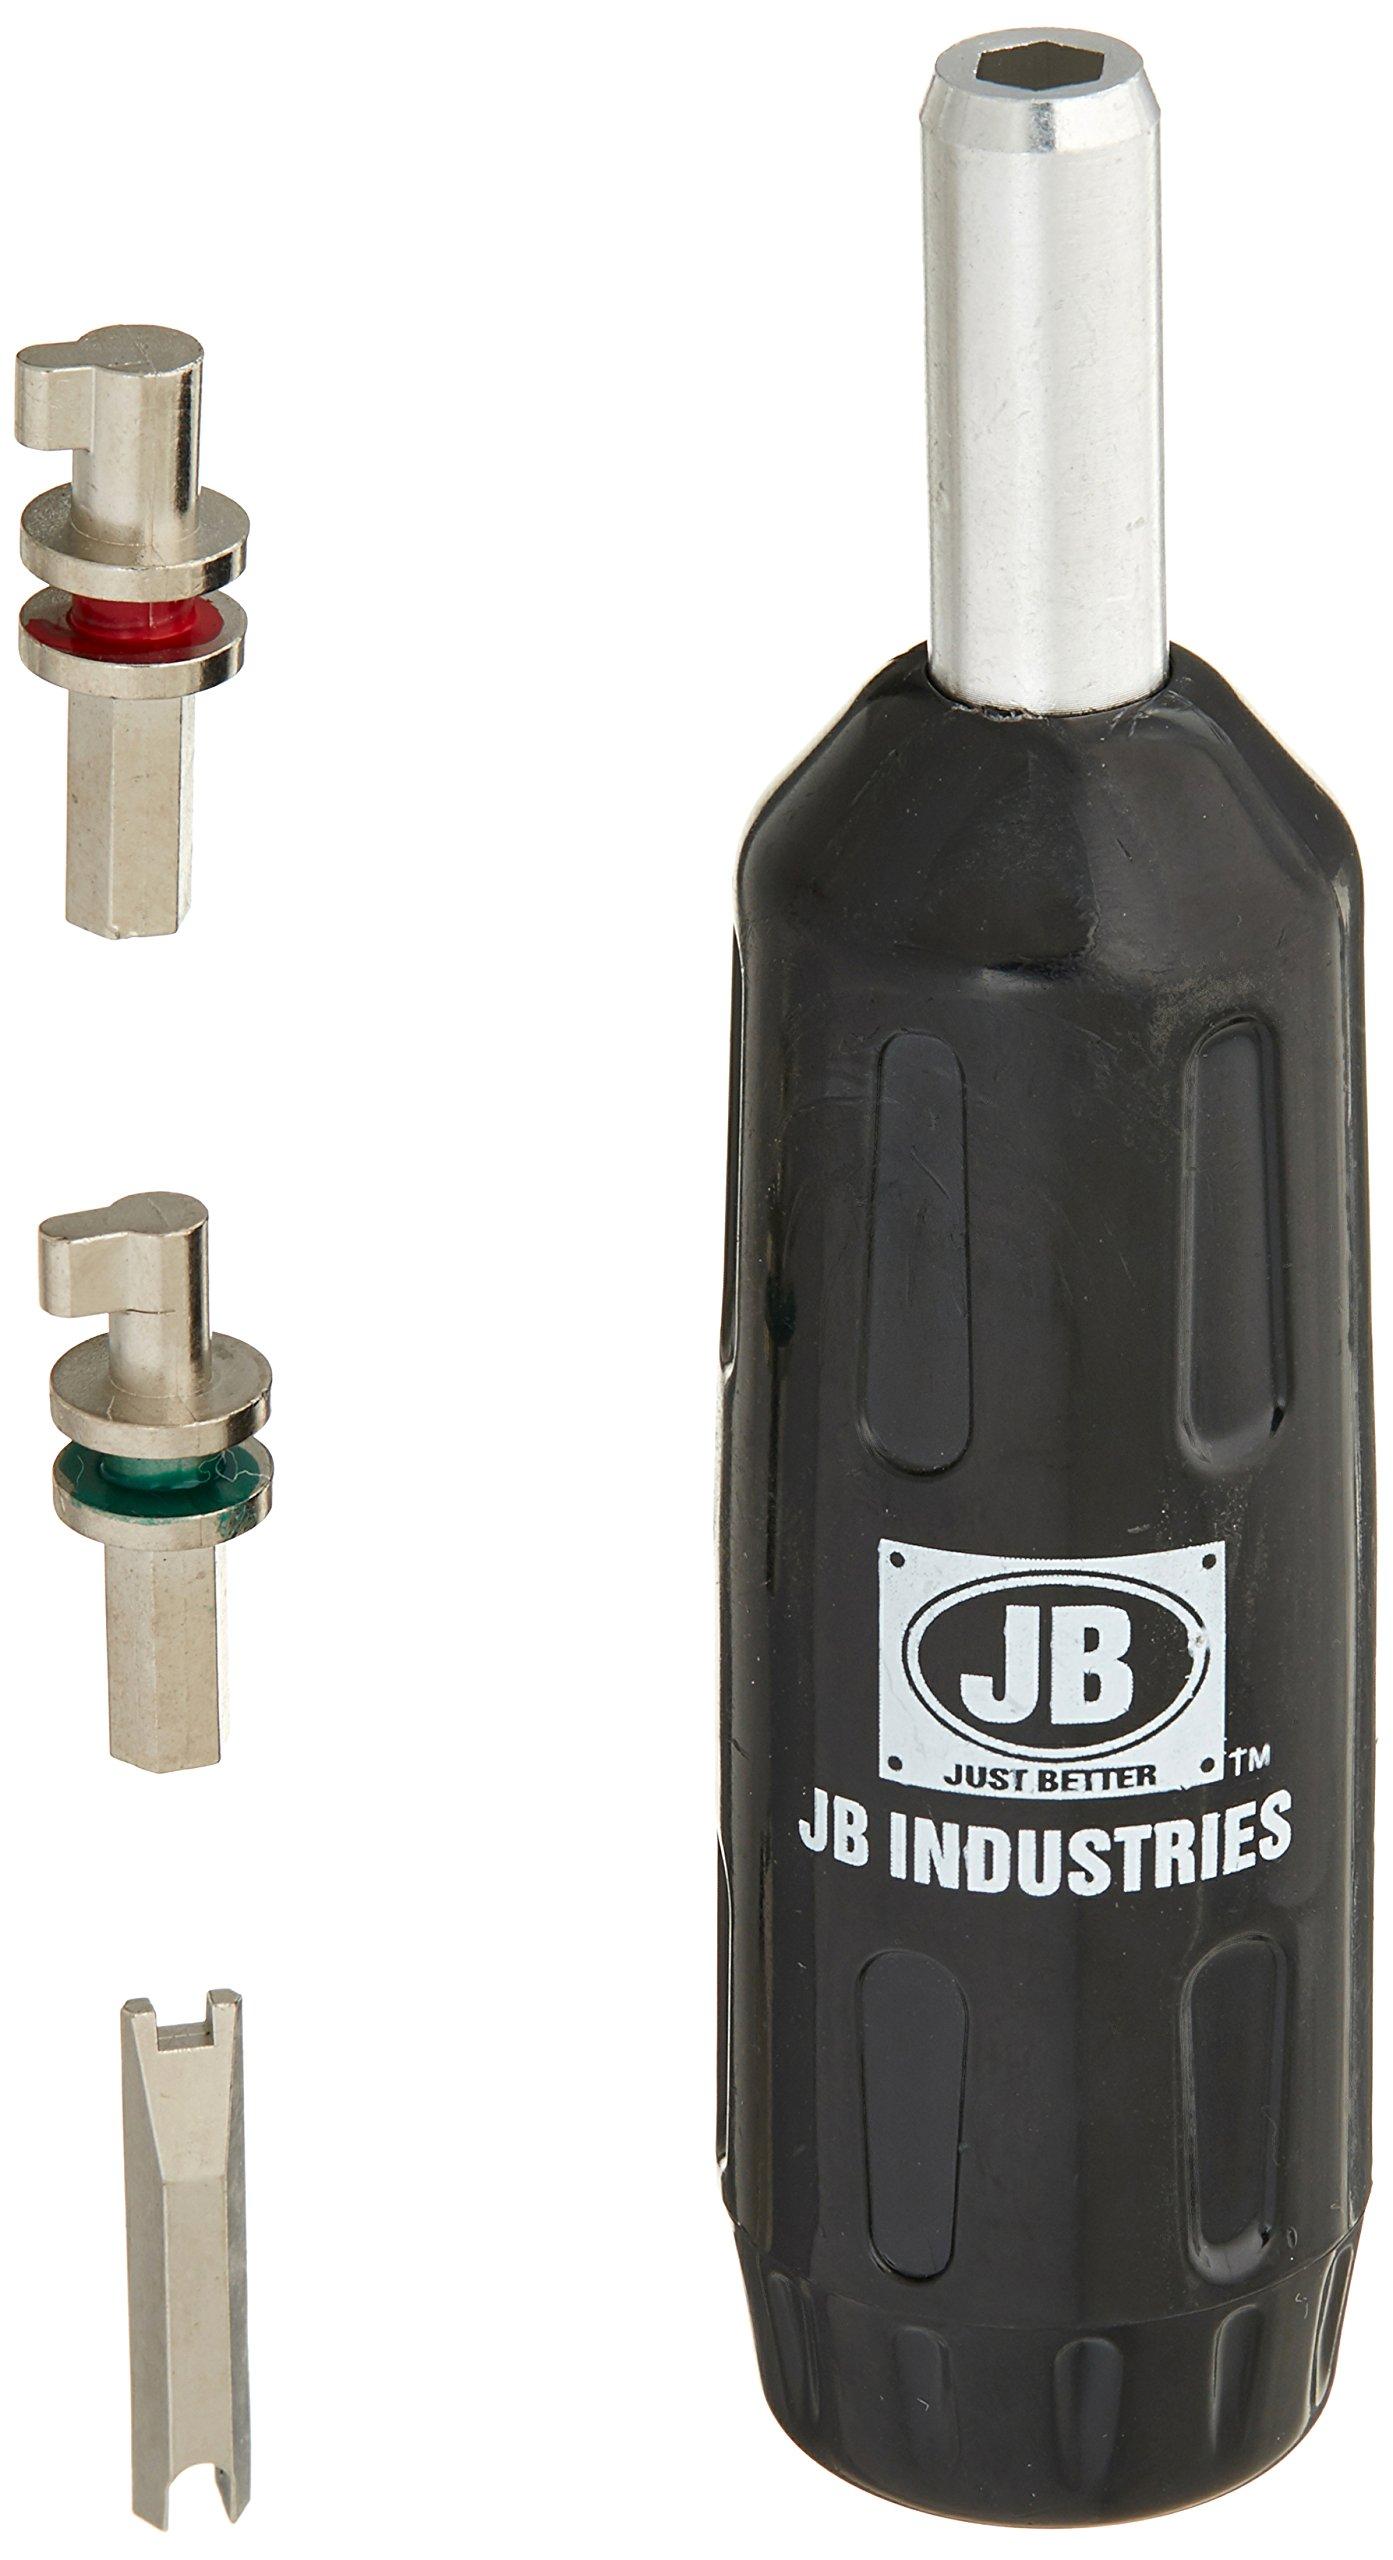 JB Industries SHLD-Multi Shield Locking Caps Multi-Key Tool